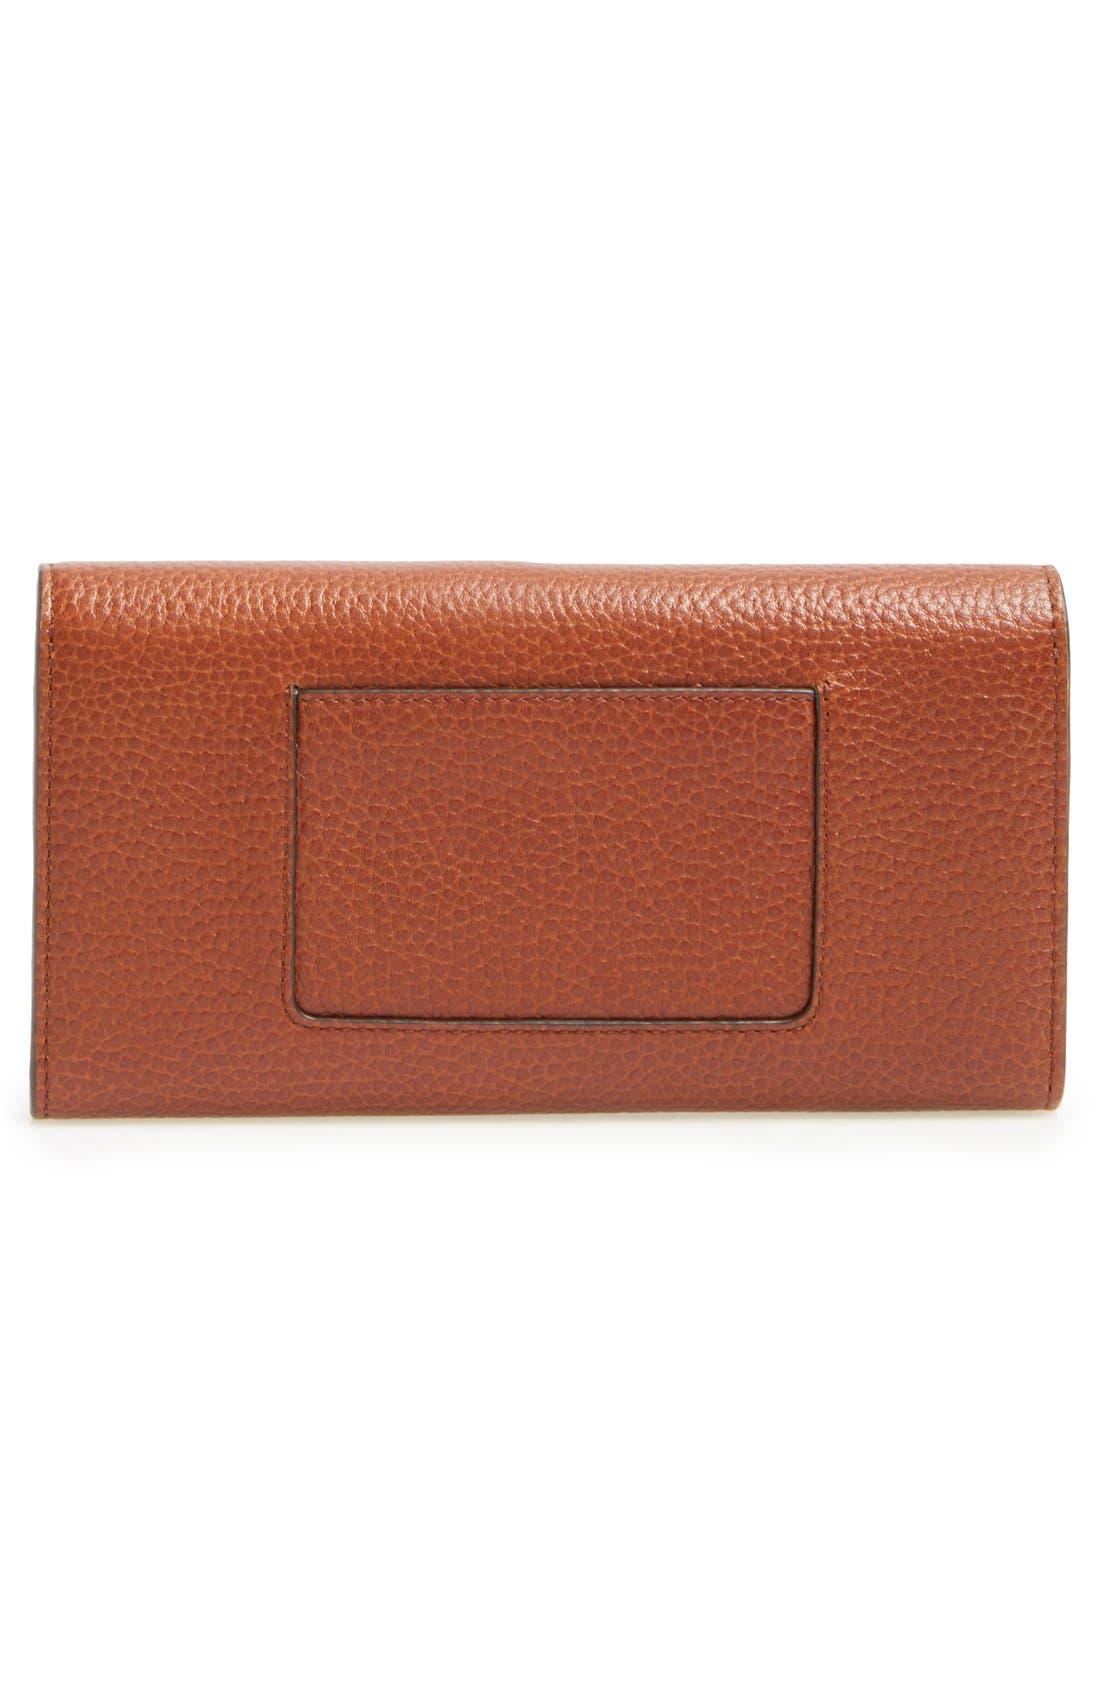 Alternate Image 3  - Mulberry 'Postman's Lock' Leather Wallet